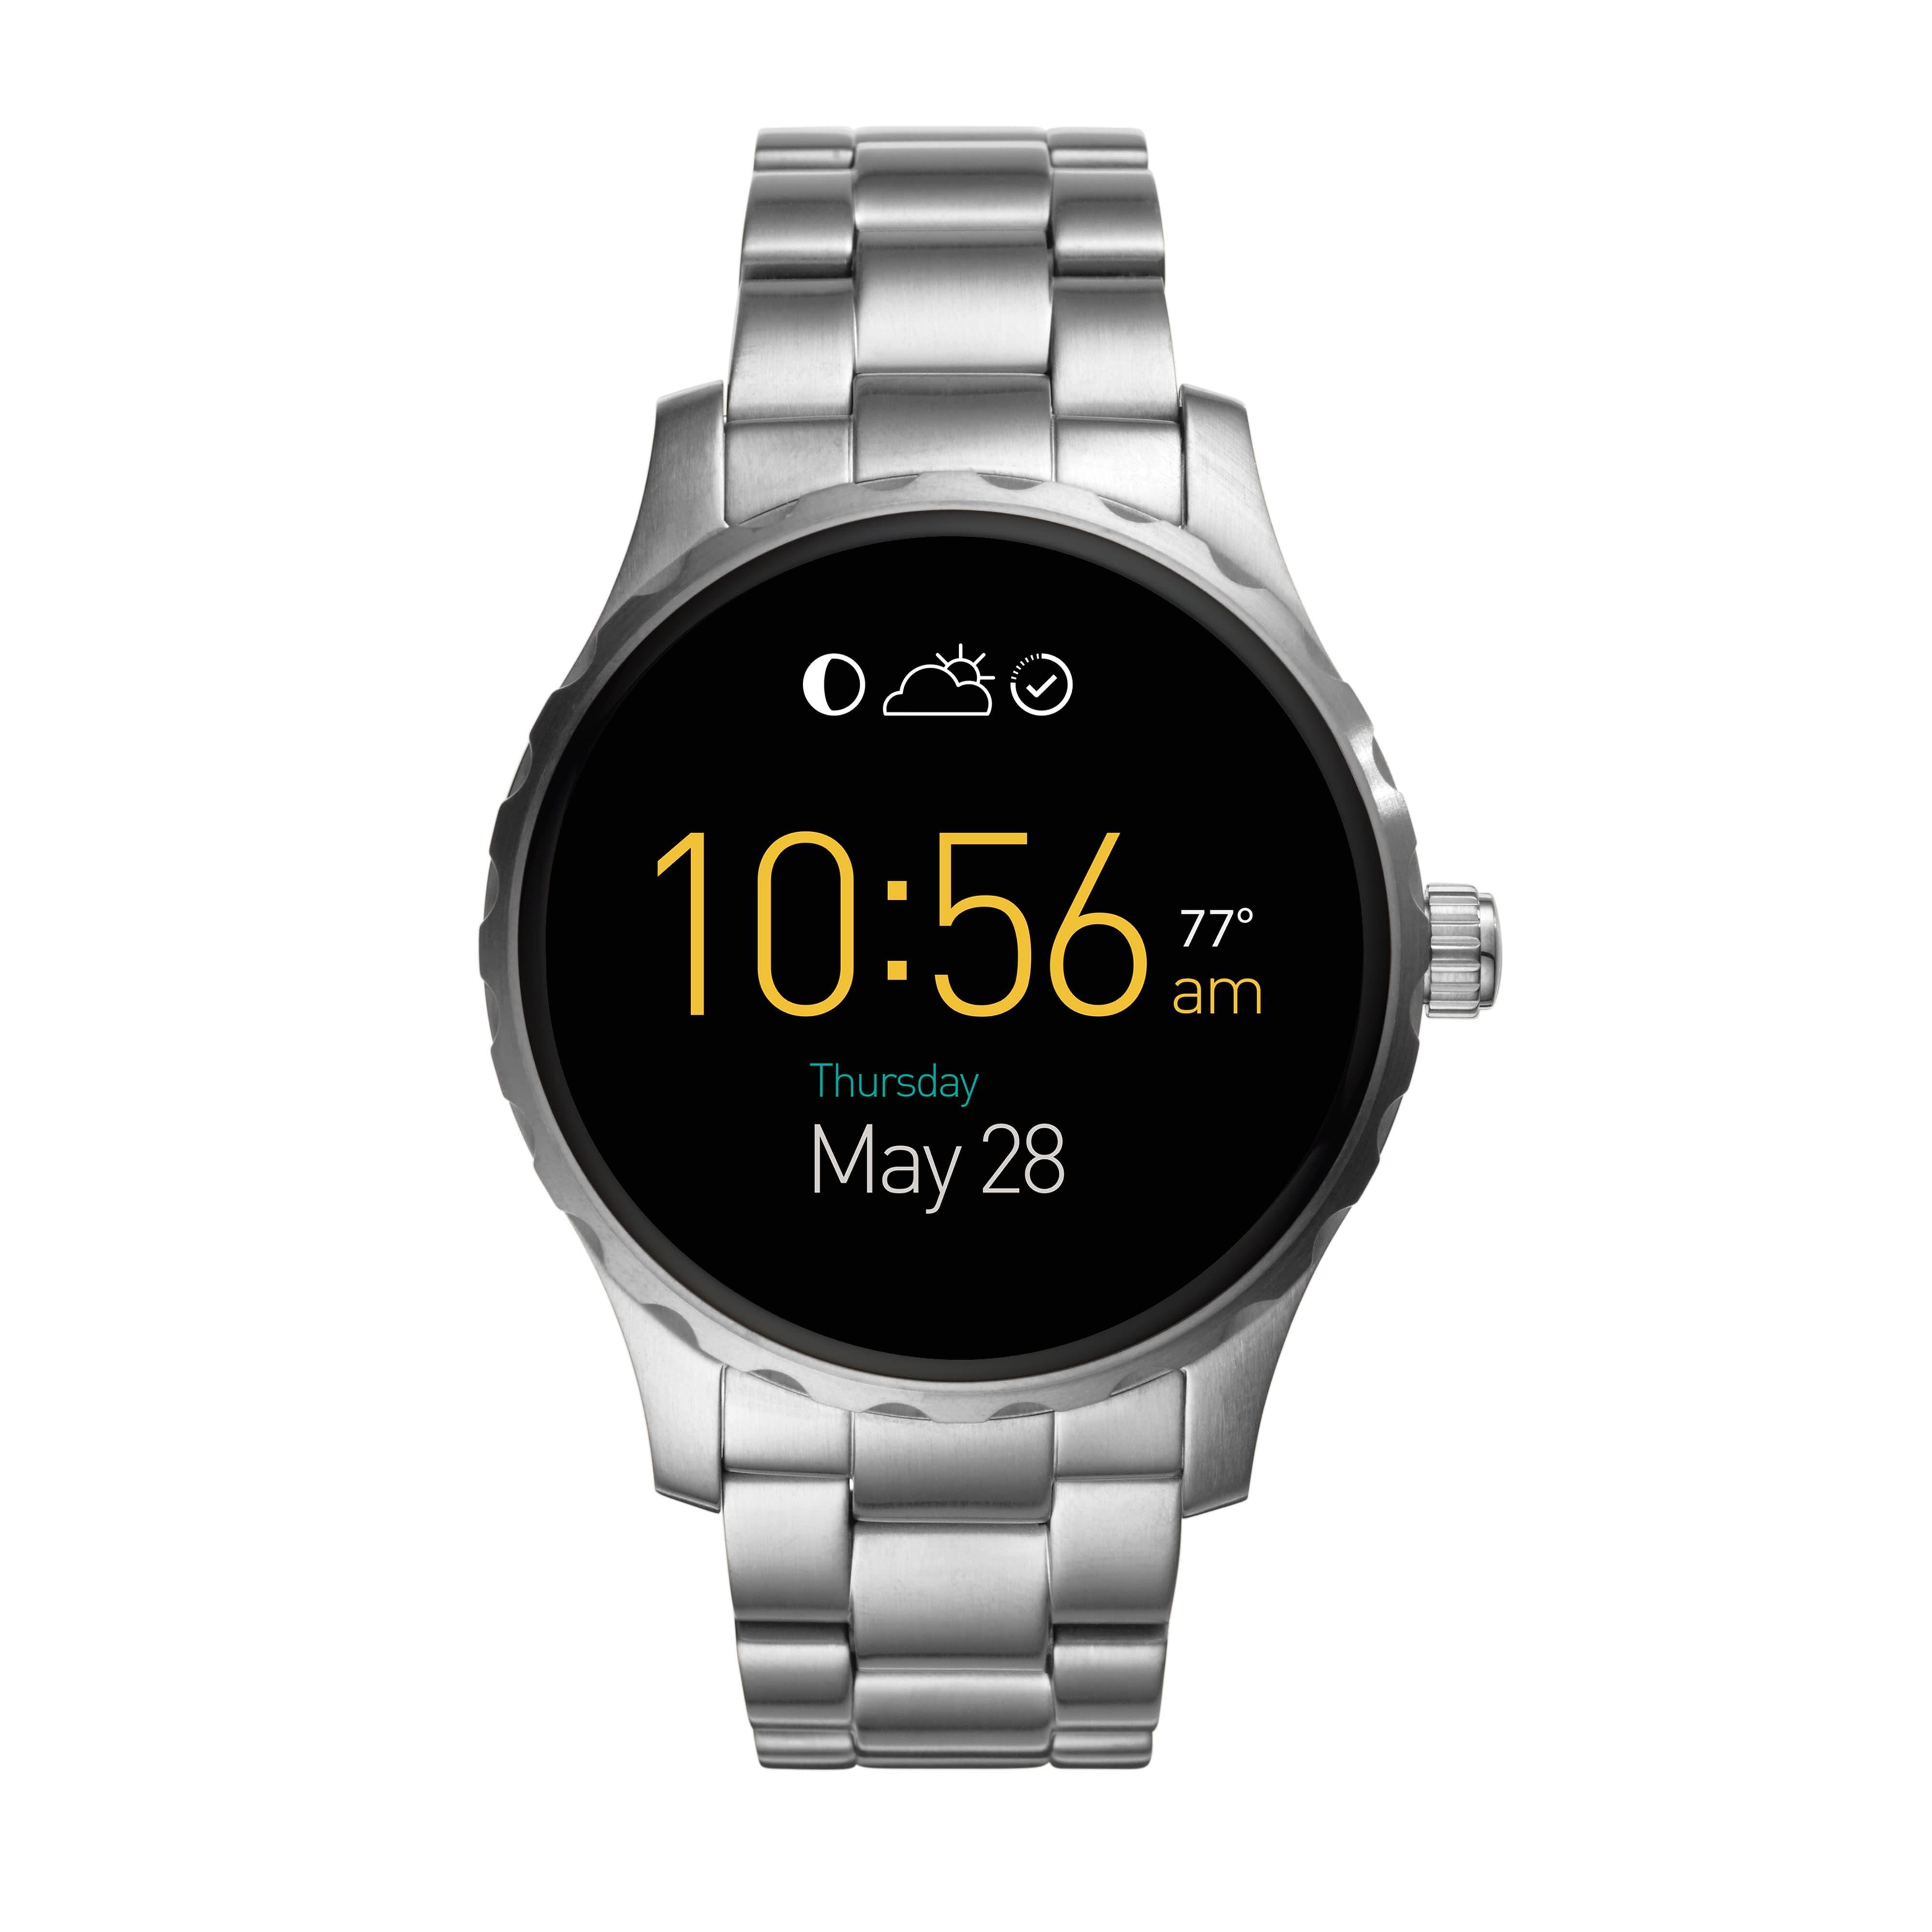 4d43bc5236d Relógio Smartwatch Fossil Q FTW2109 1CI